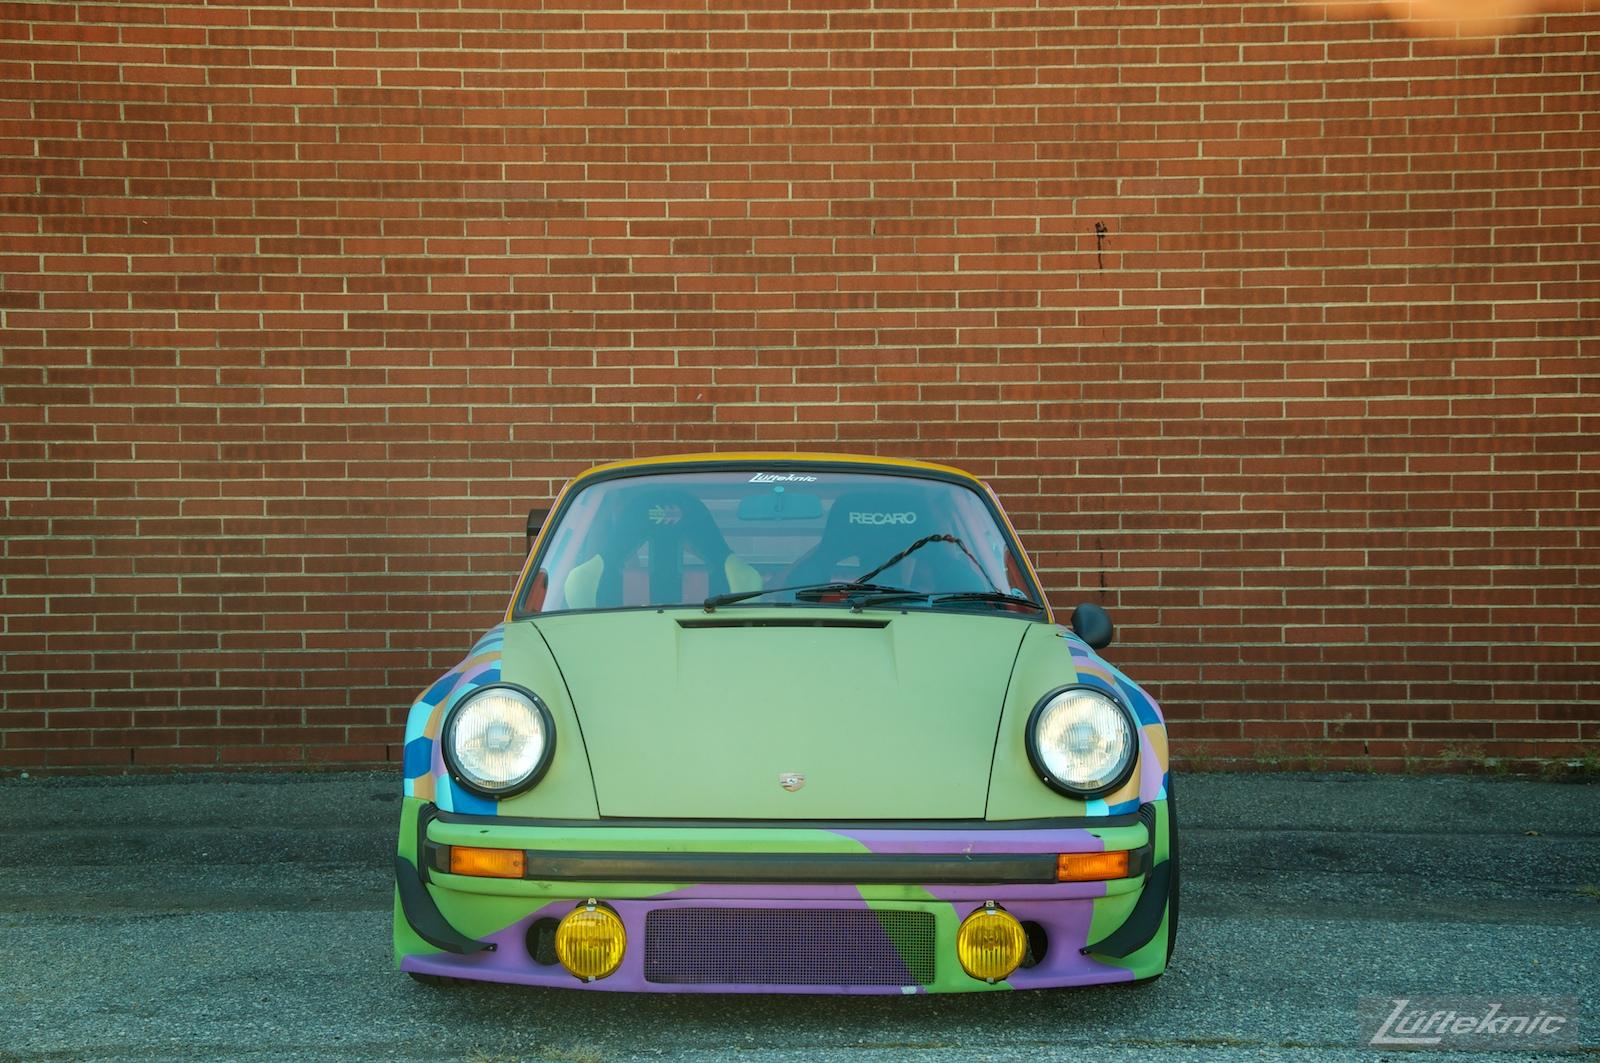 Lüfteknic #projectstuka Porsche 930 Turbo in front of a brick wall